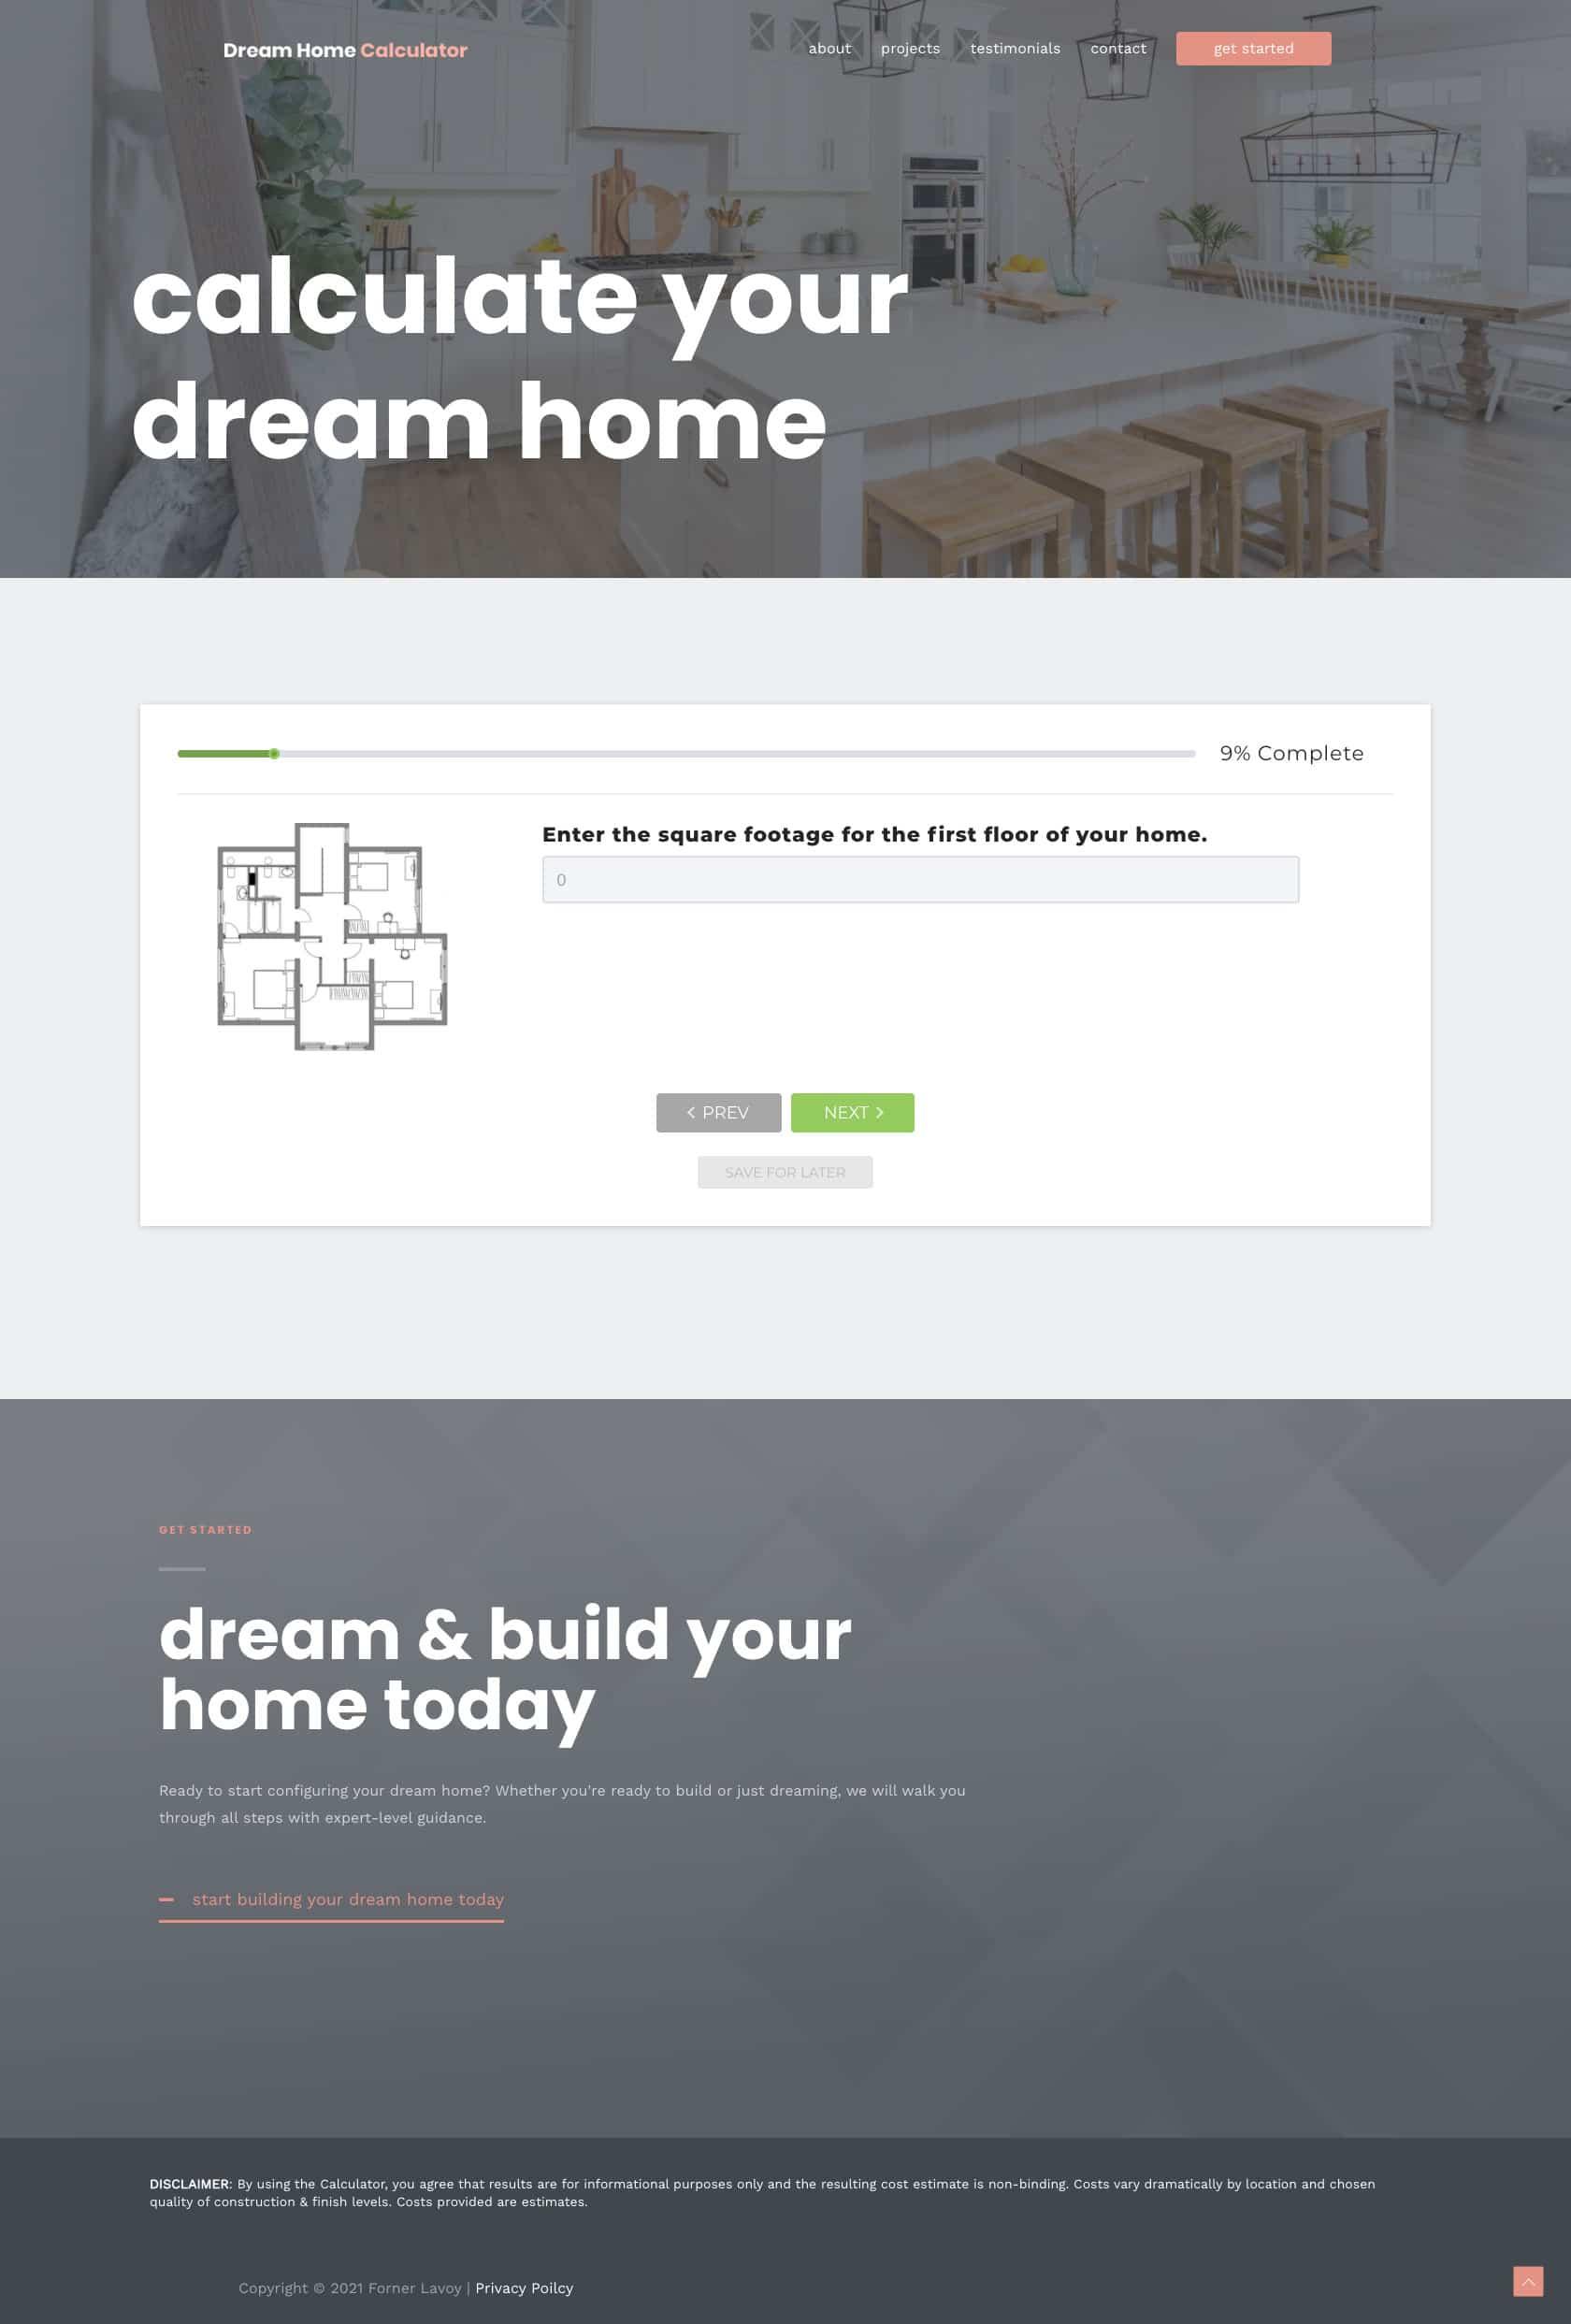 Dream Home Calculator Step 2